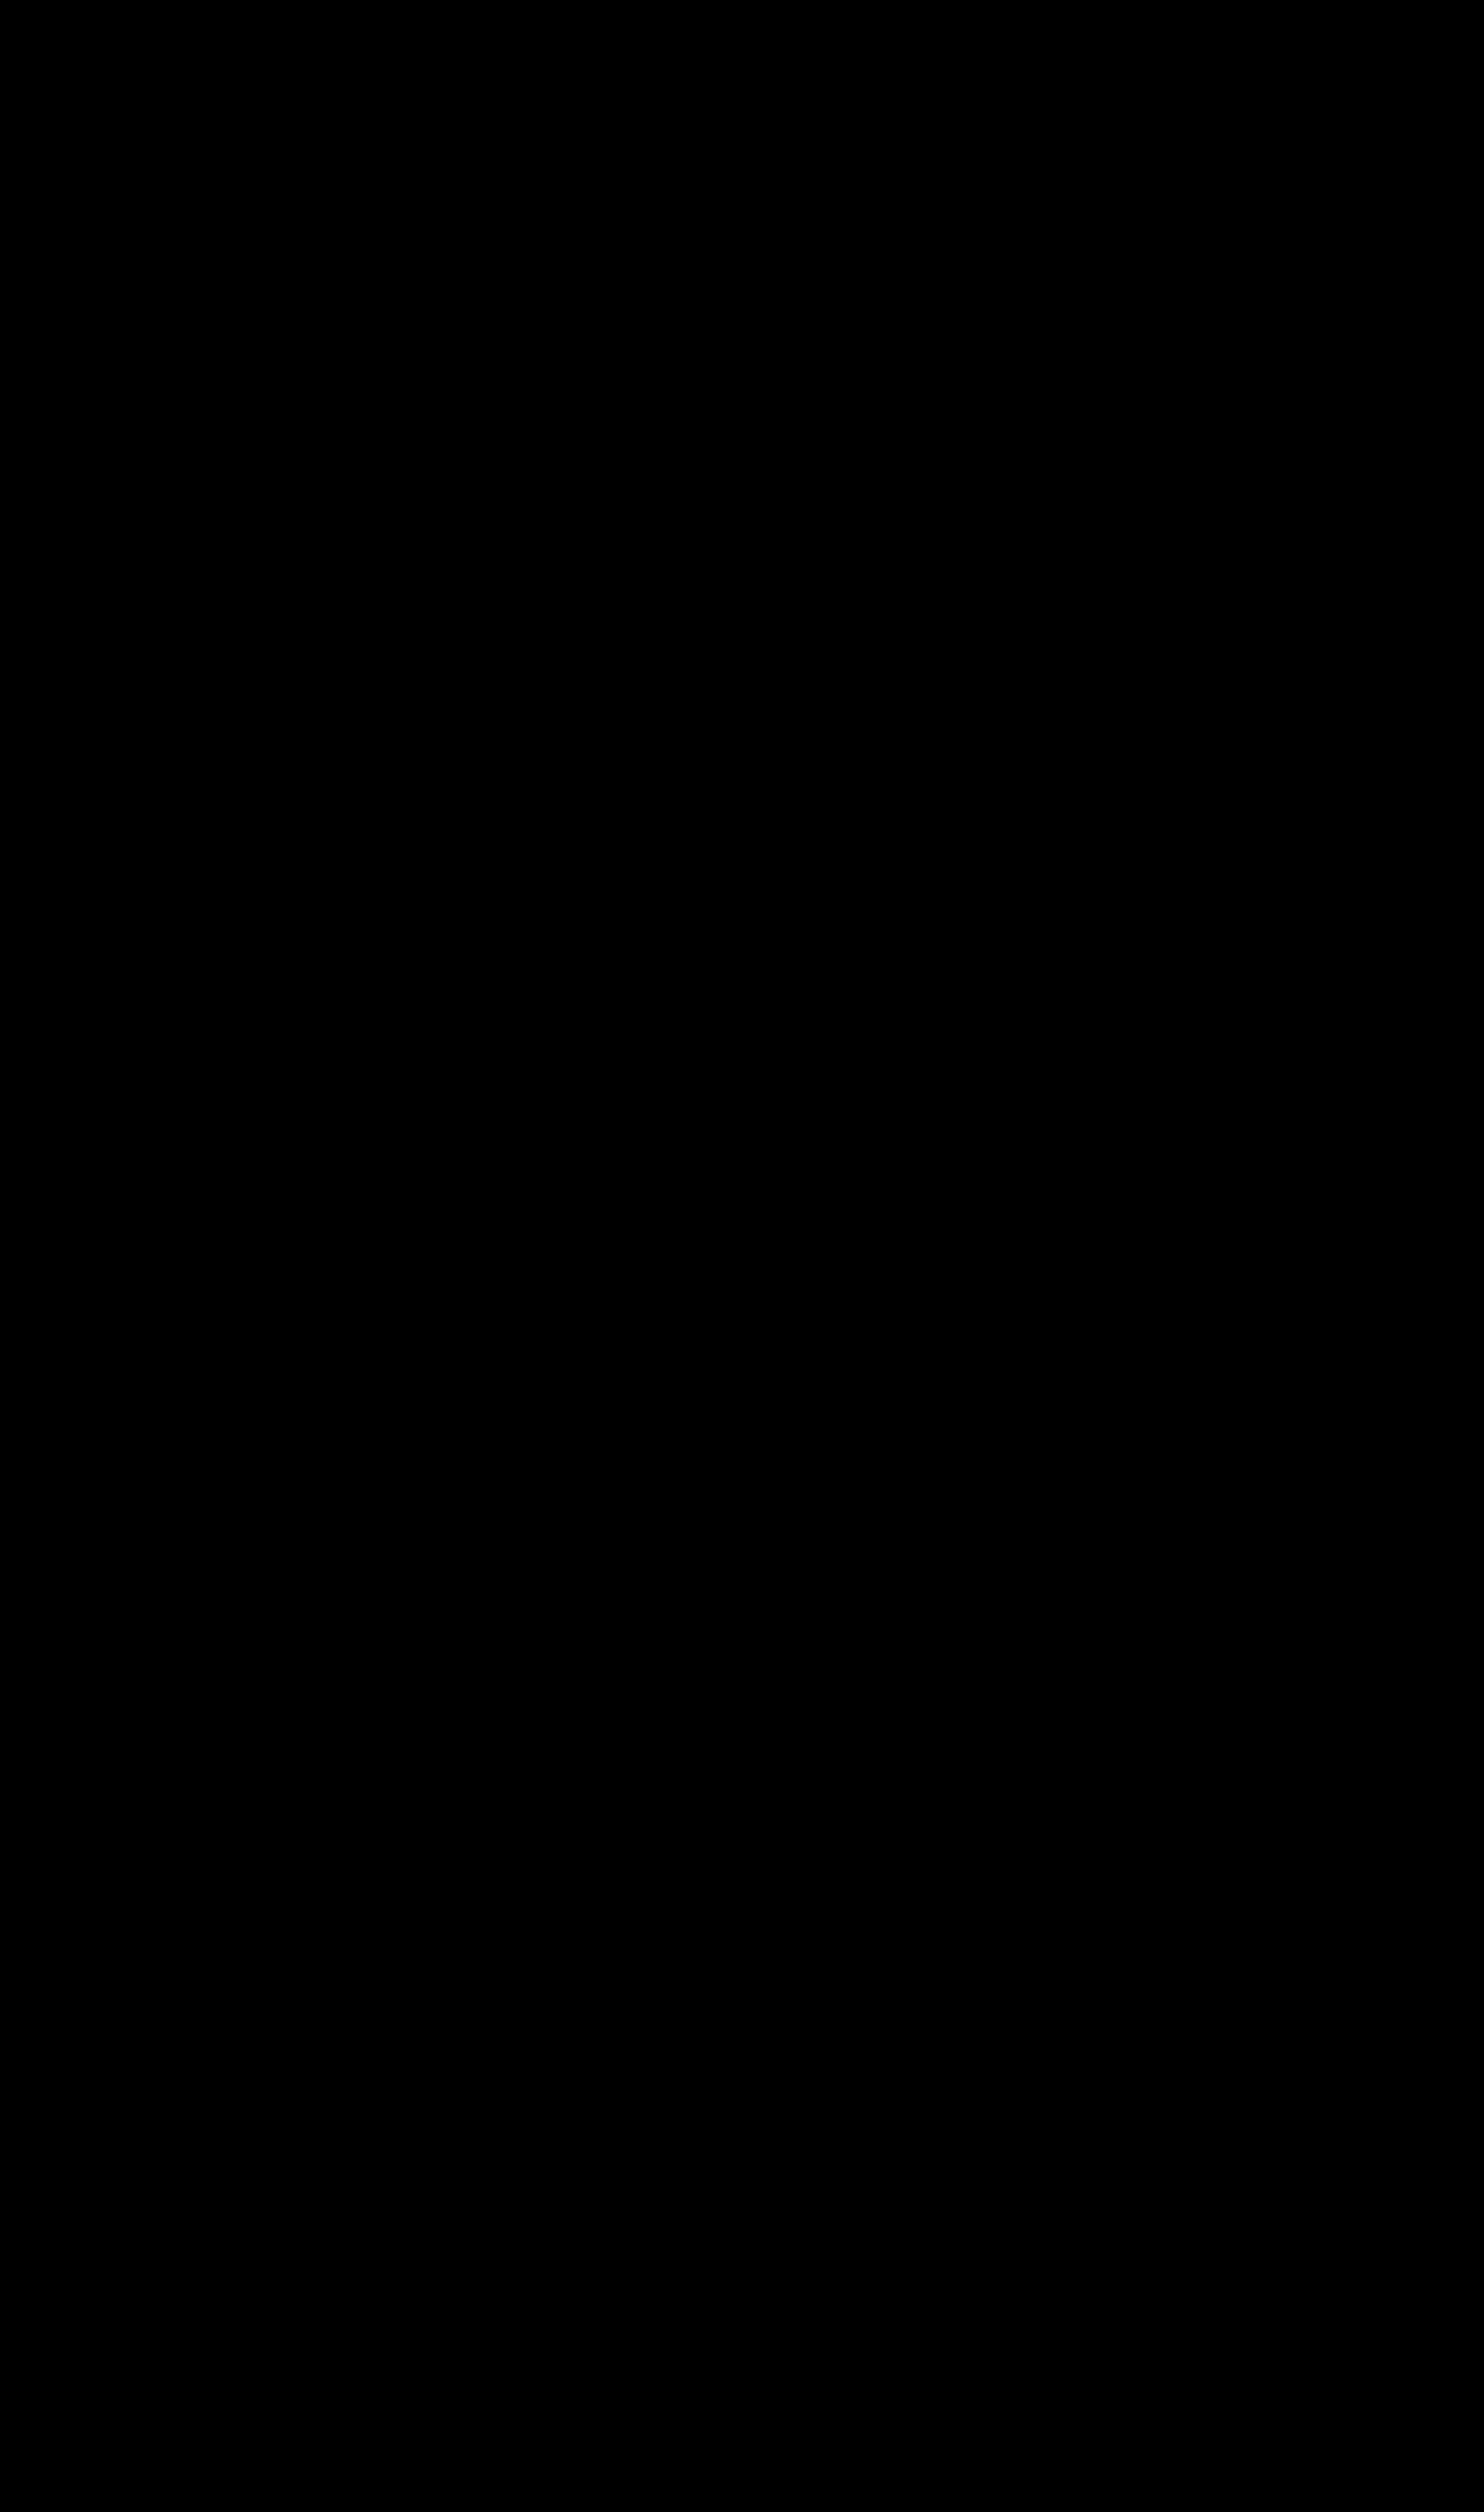 px svg png. Light bulb clip art silhouette